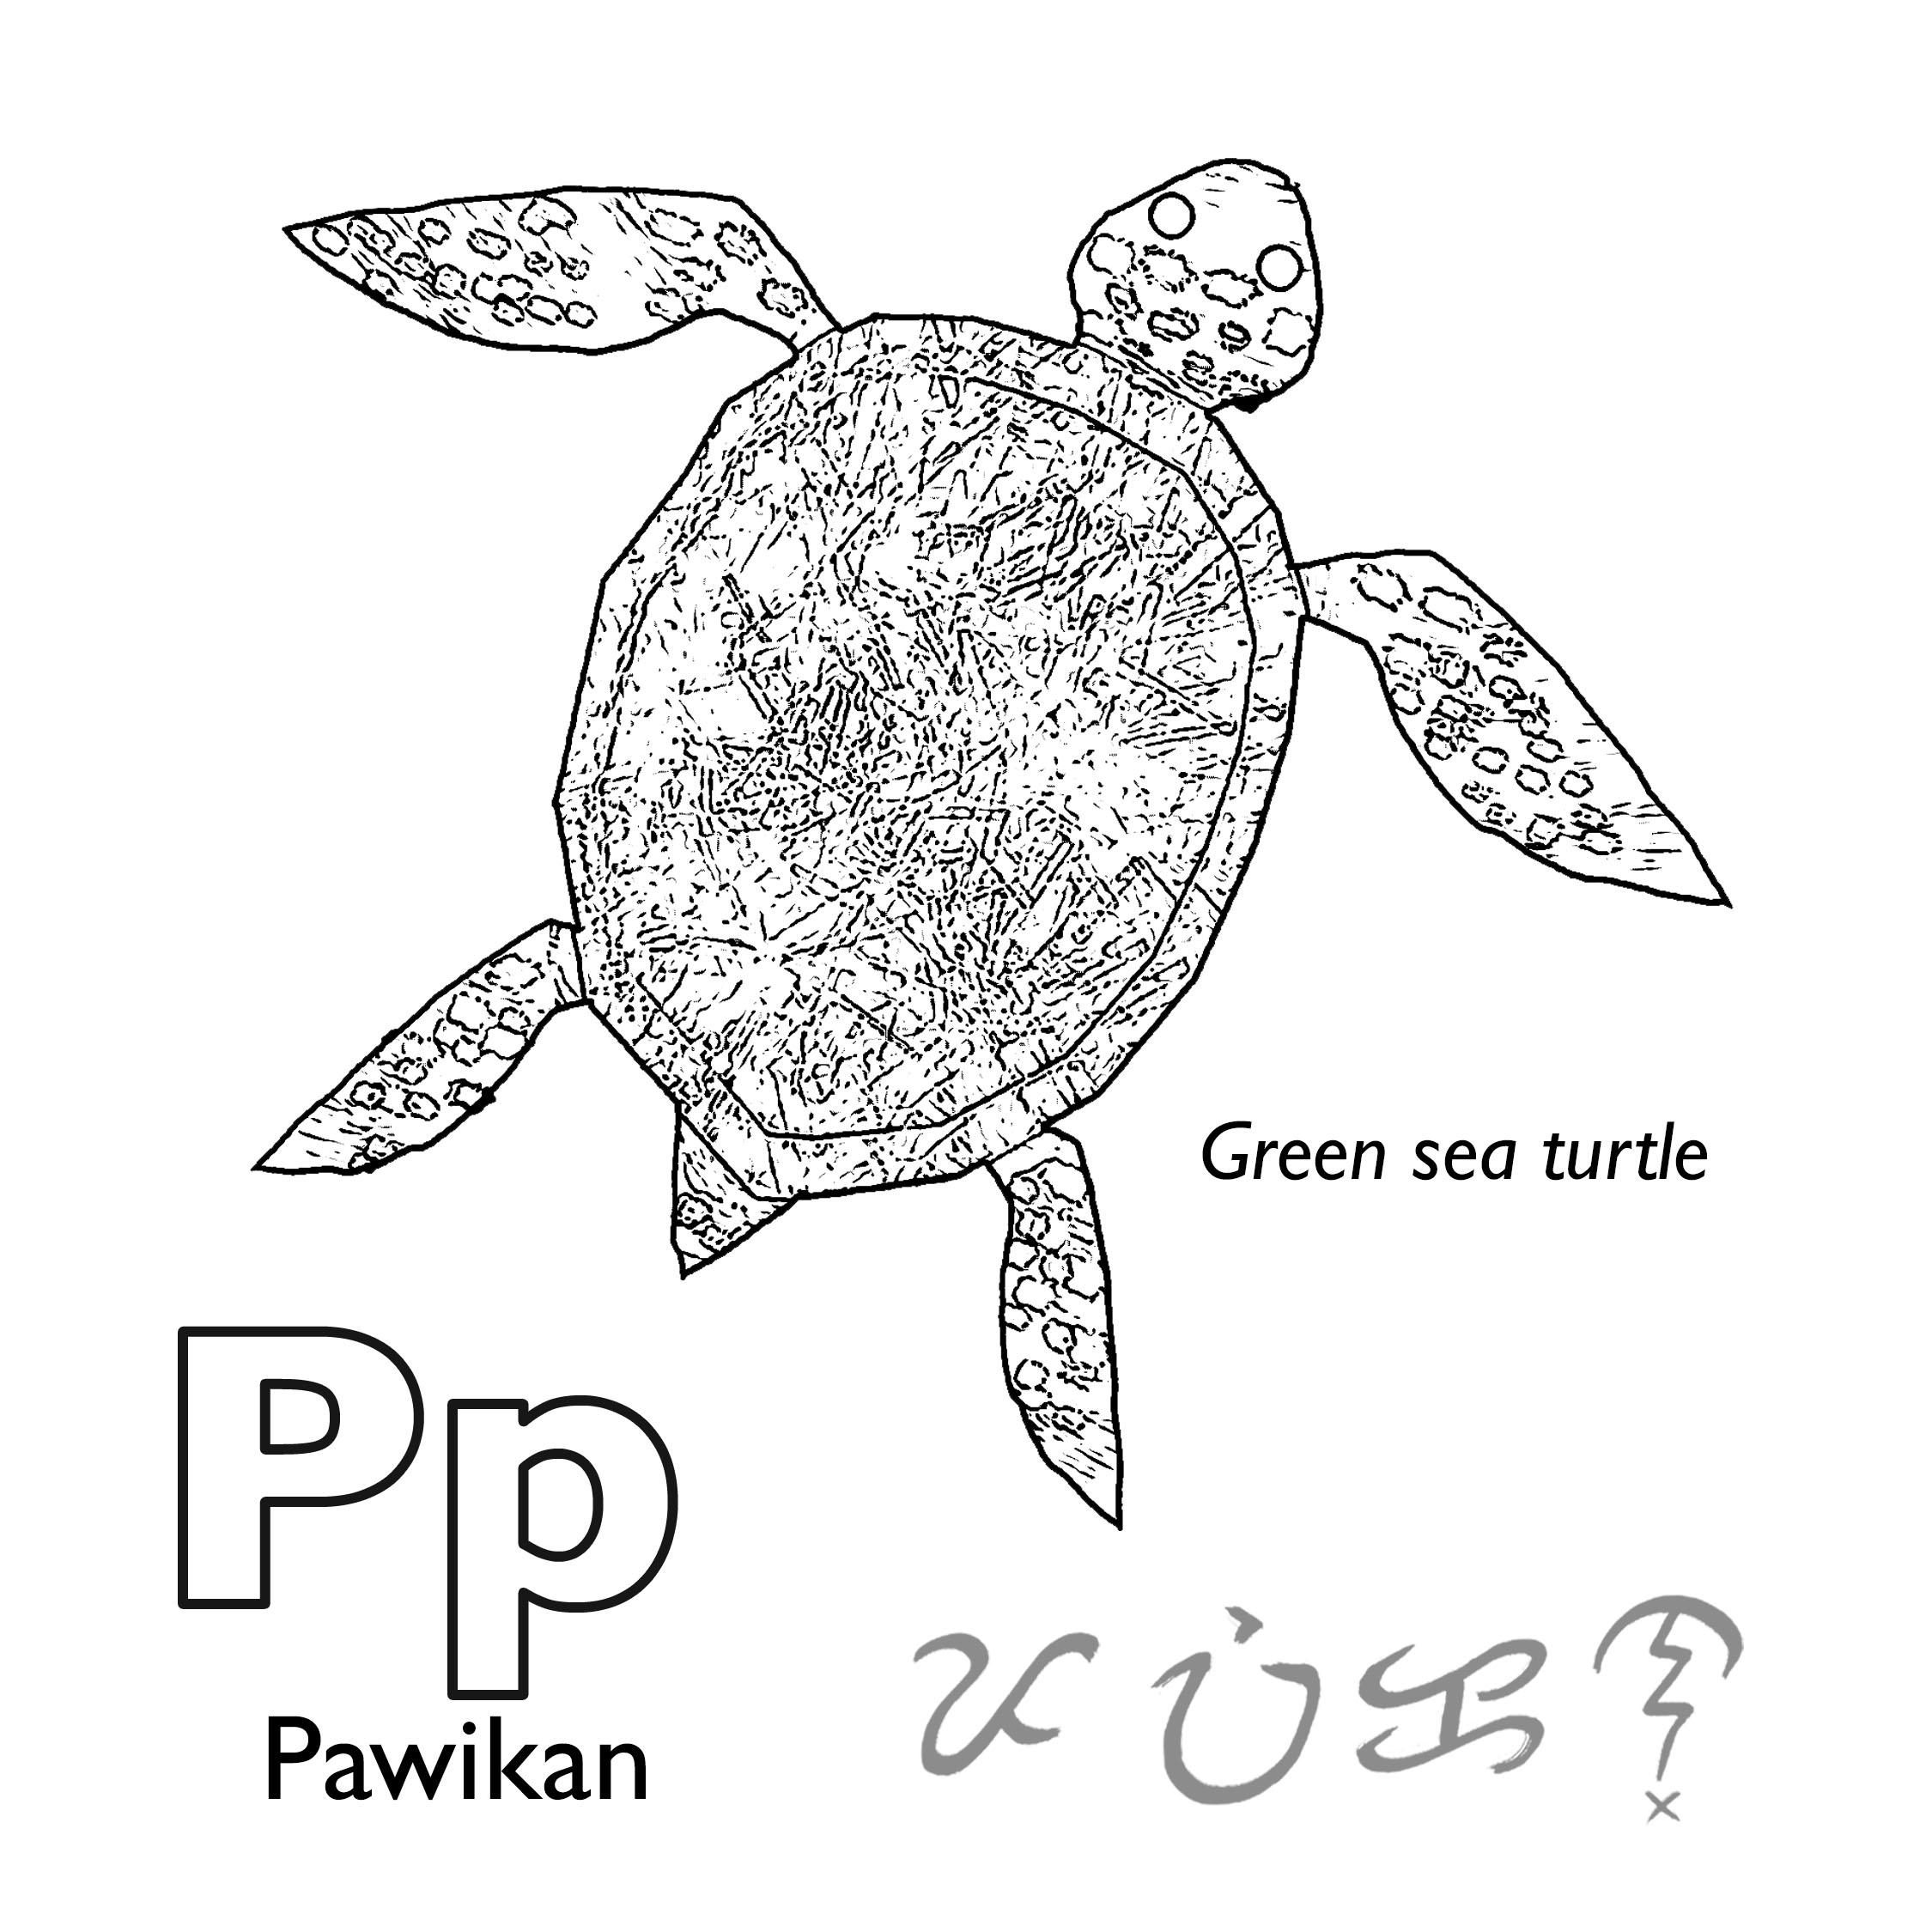 Pawikan